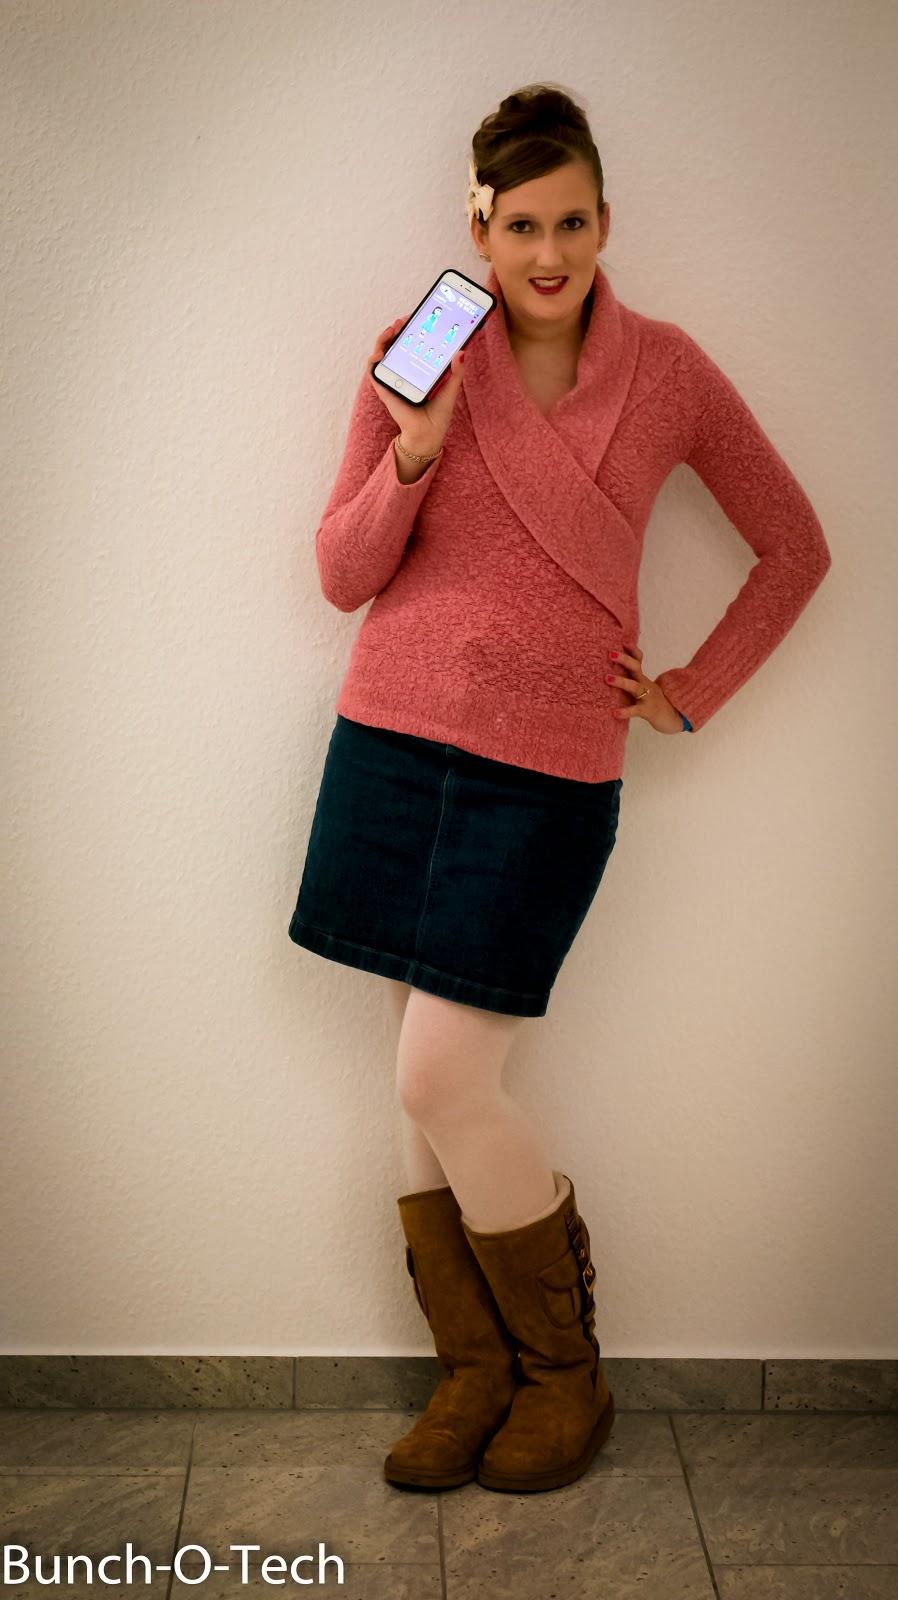 Amy-6-October%2B23%2C%2B2014.jpg